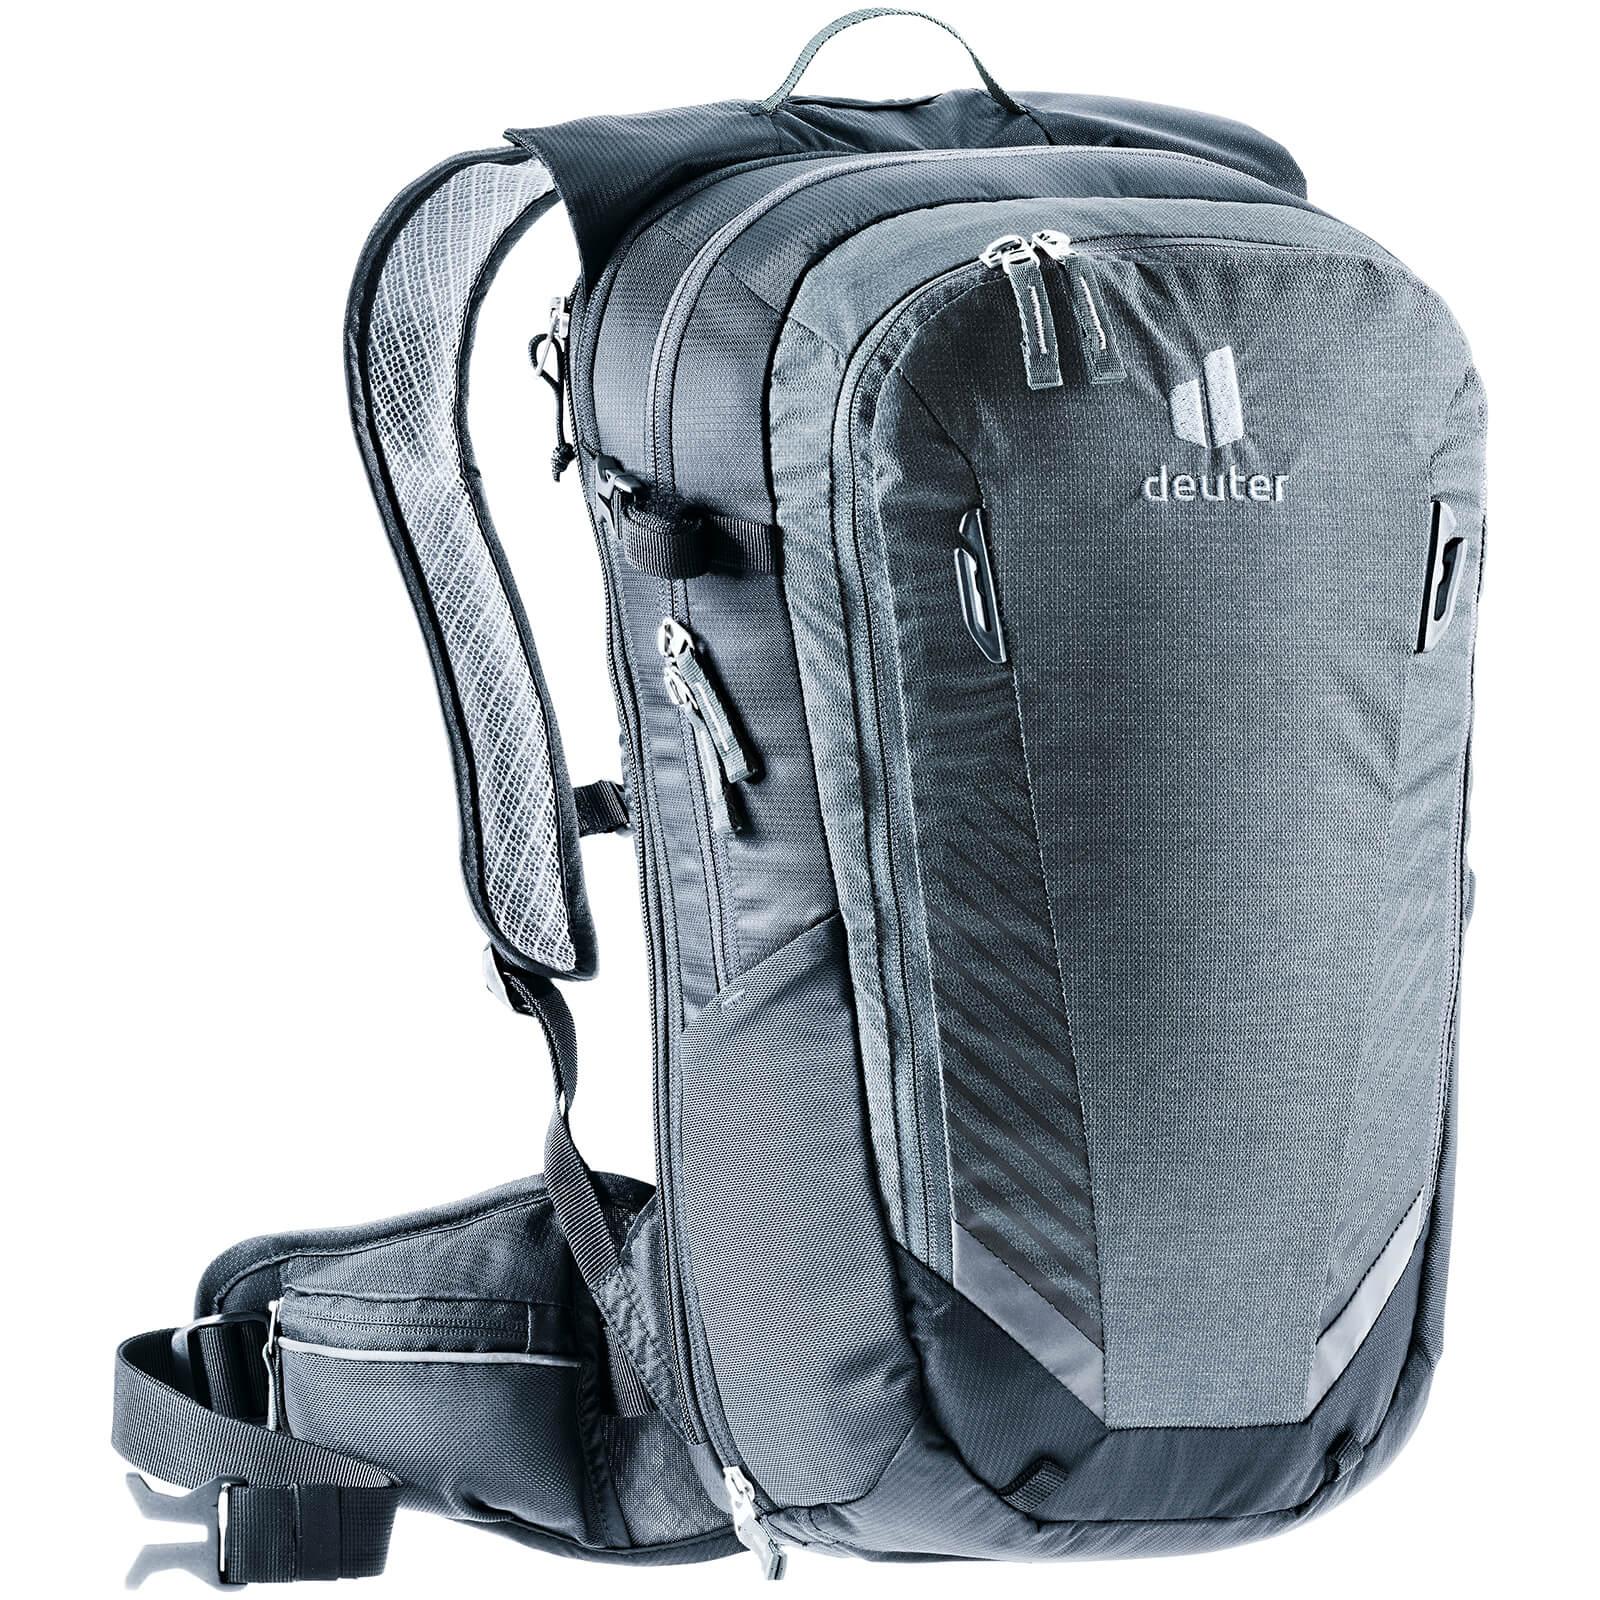 deuter Compact EXP 14 Backpack - Graphite-Black